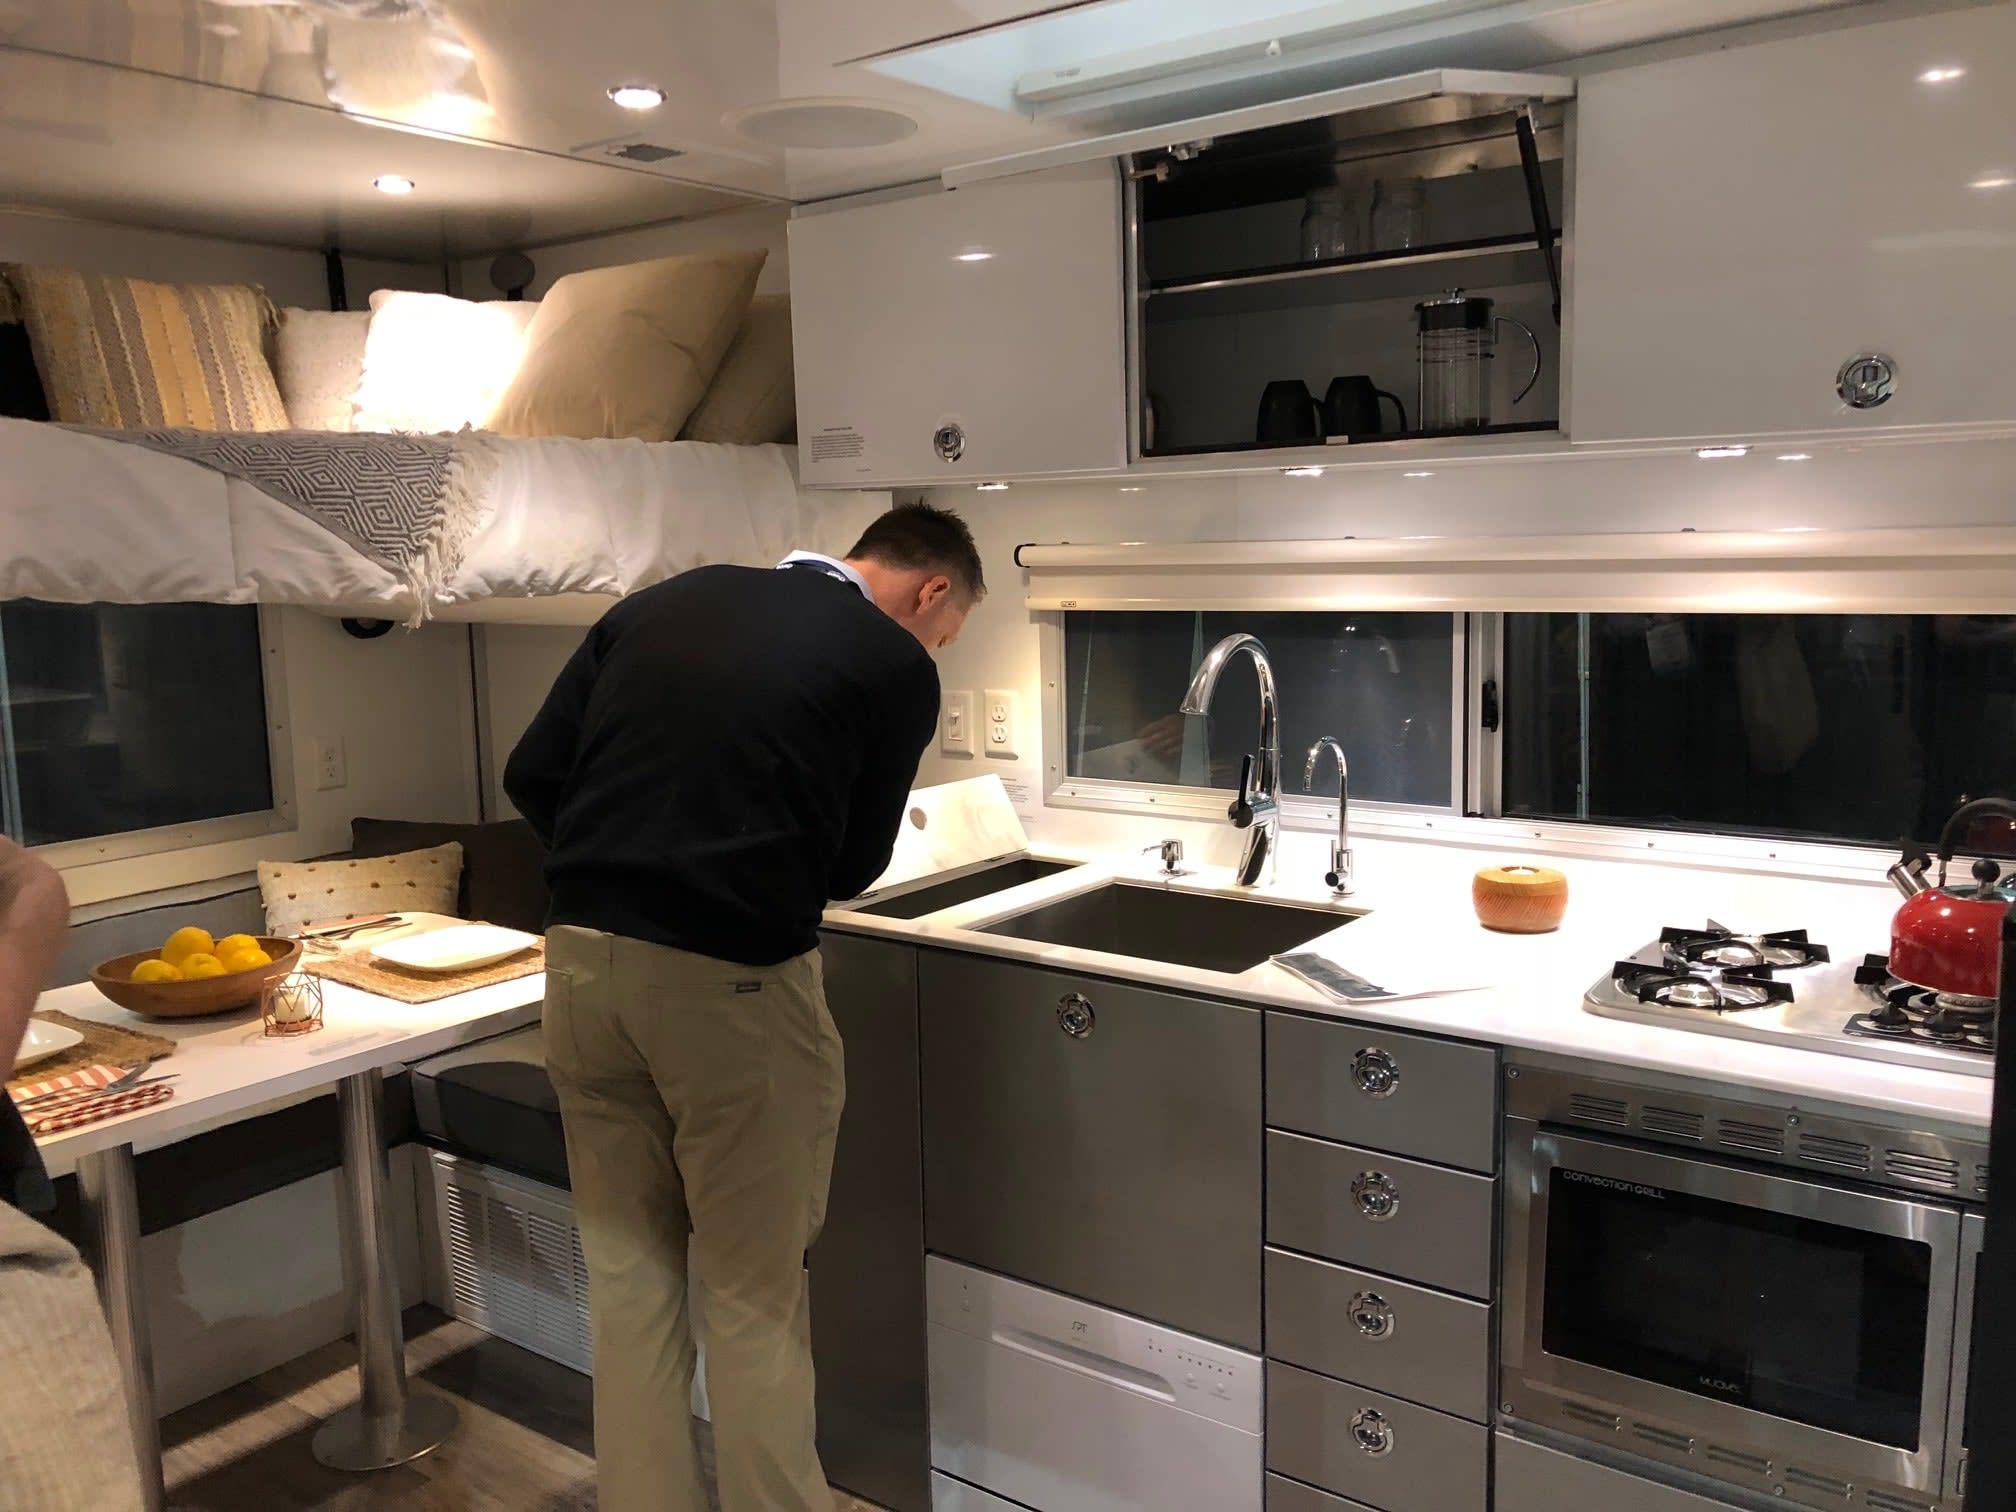 Living Vehicle Kitchen Dwell On Design 2018 Los